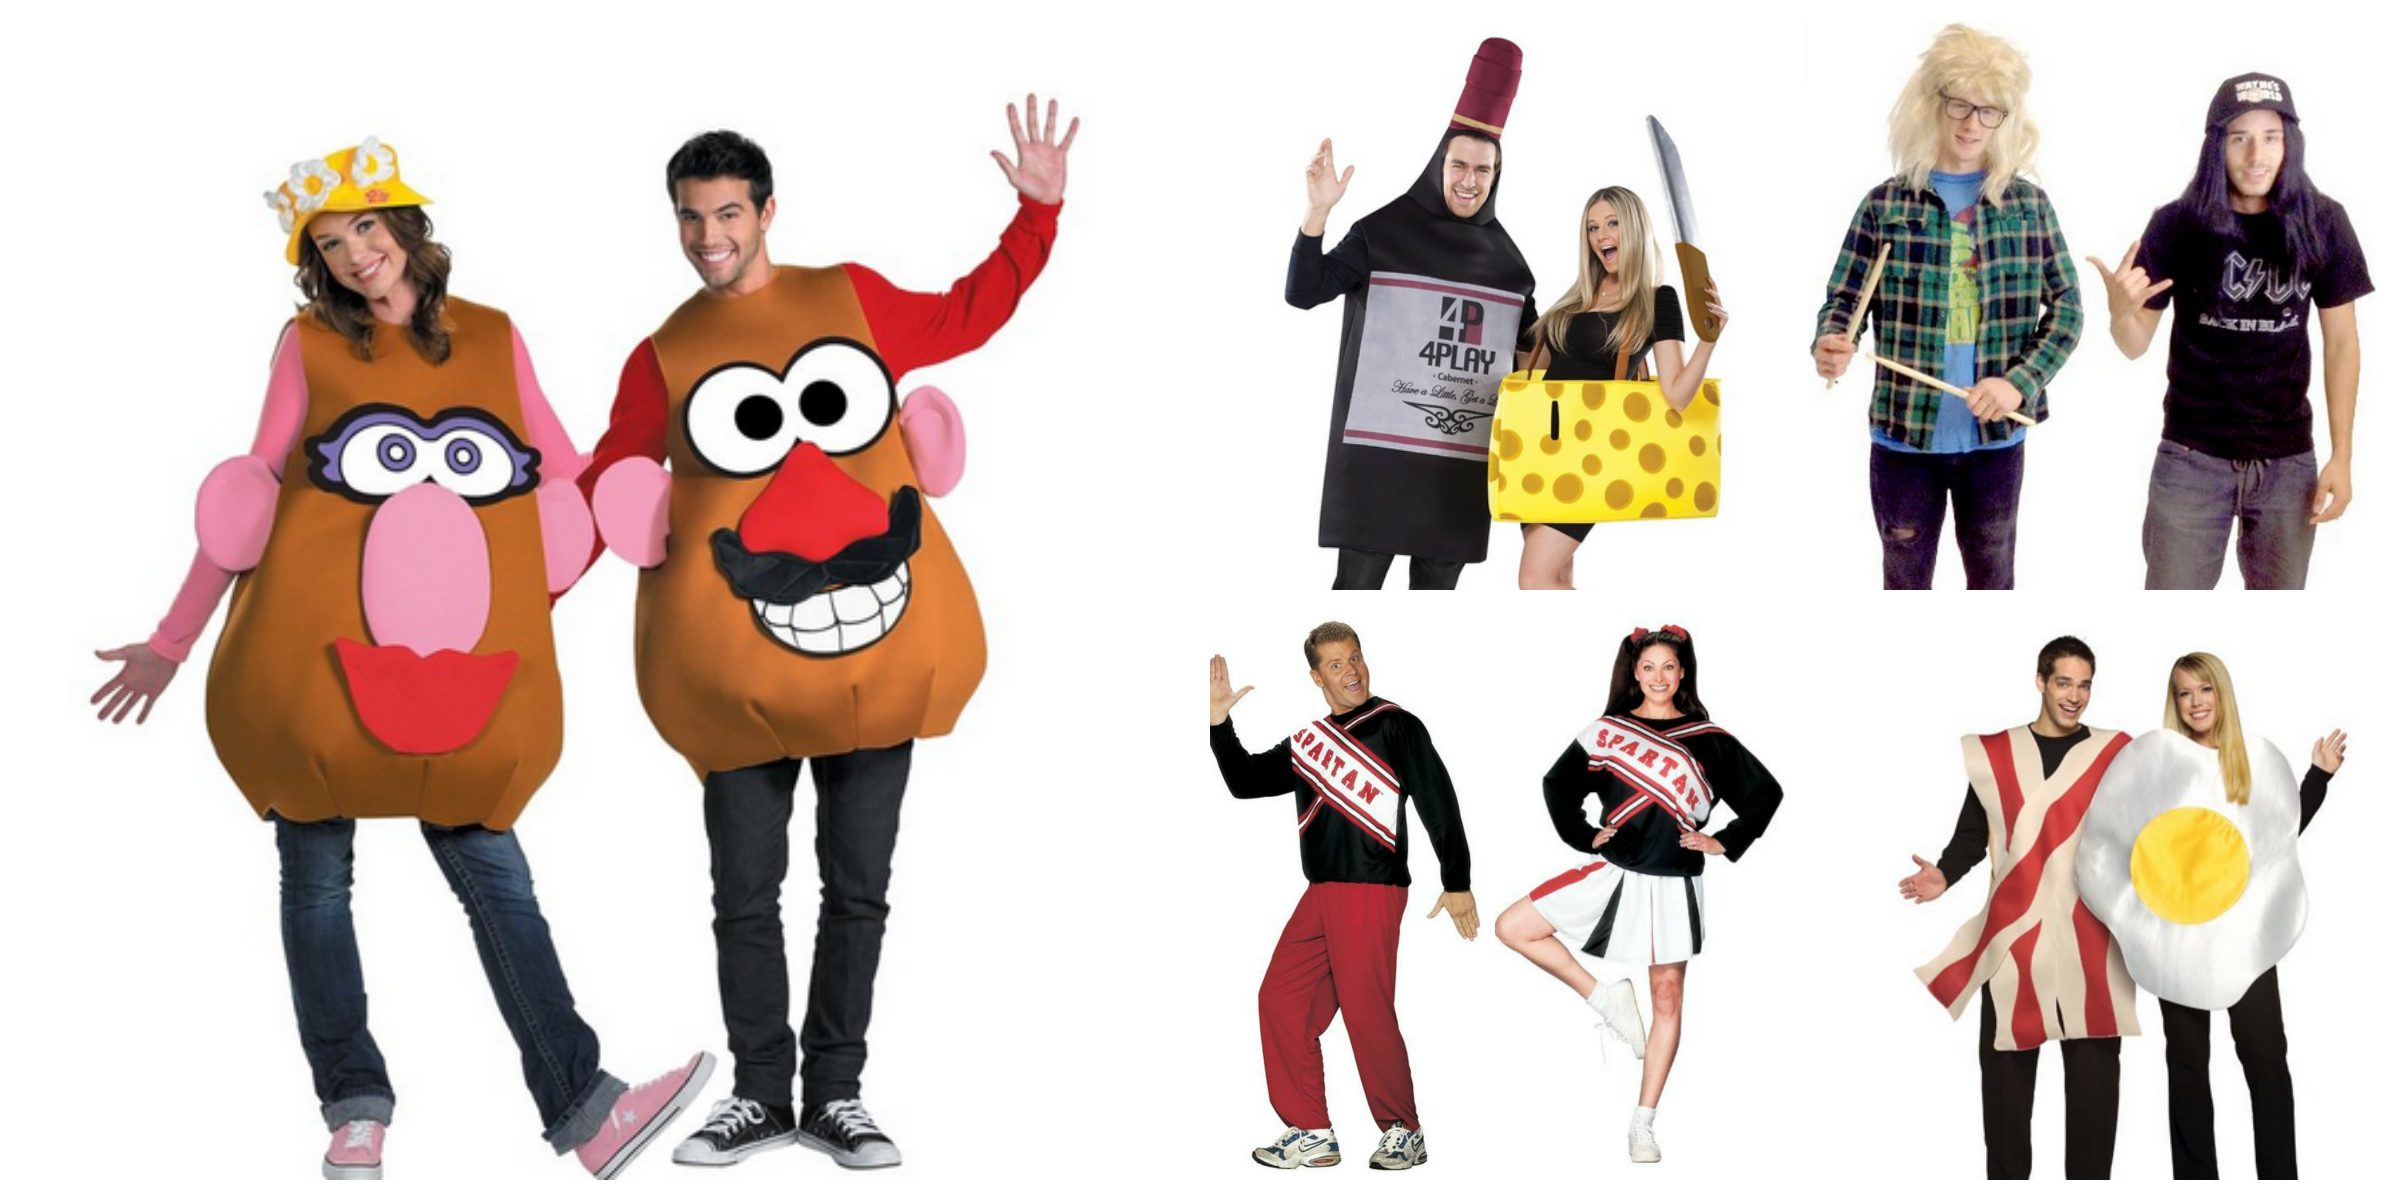 Fullsize Of Funny Halloween Costumes 2015